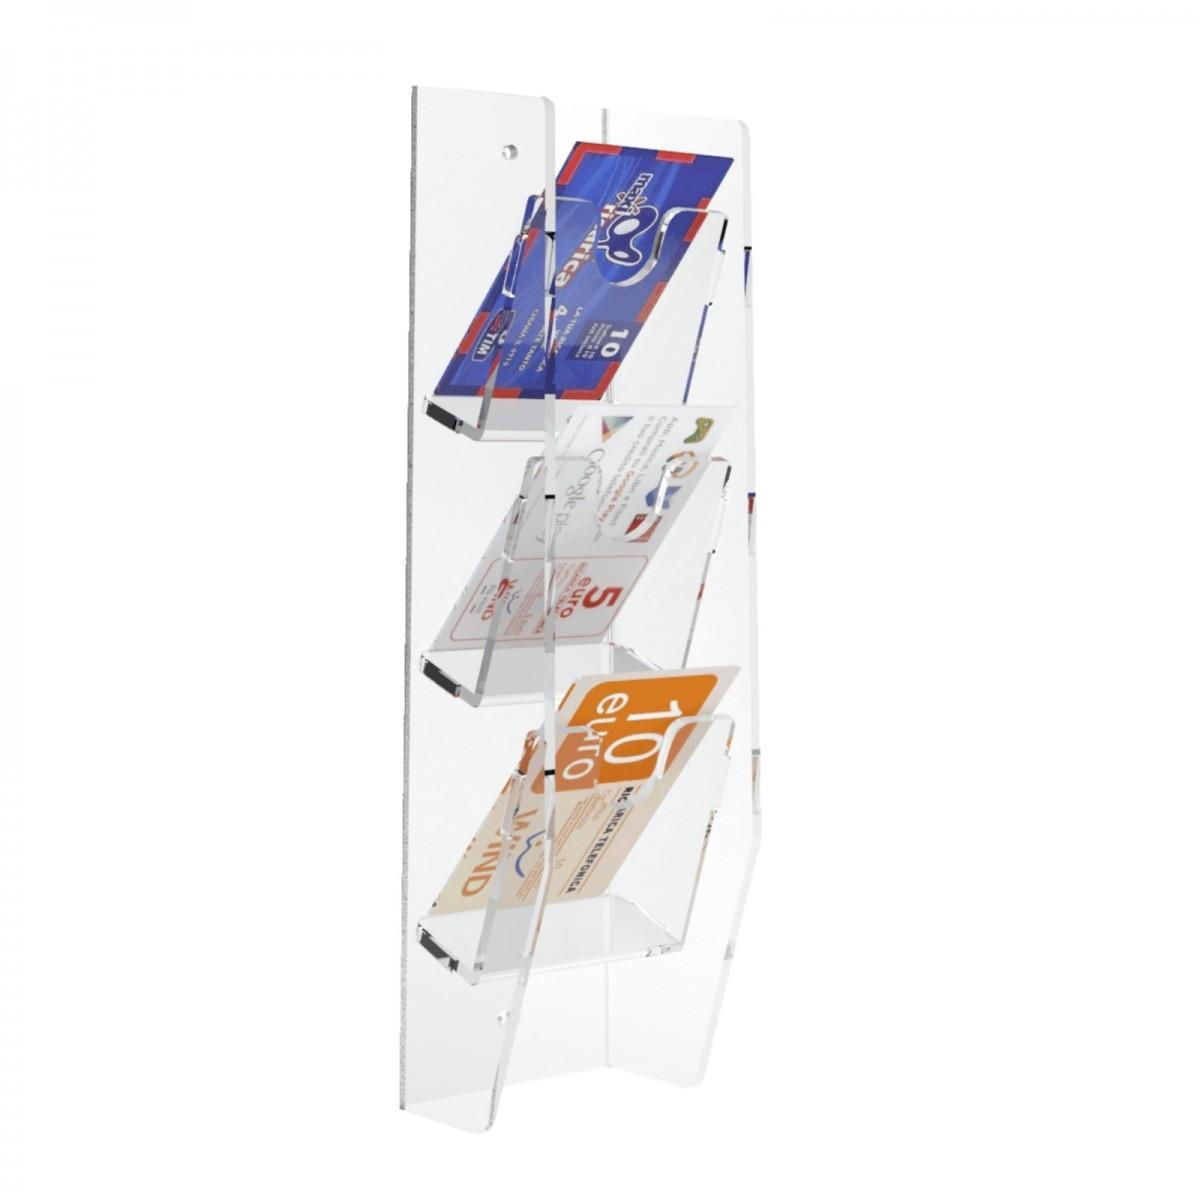 Expositor de pared para tarjetas telefónicas